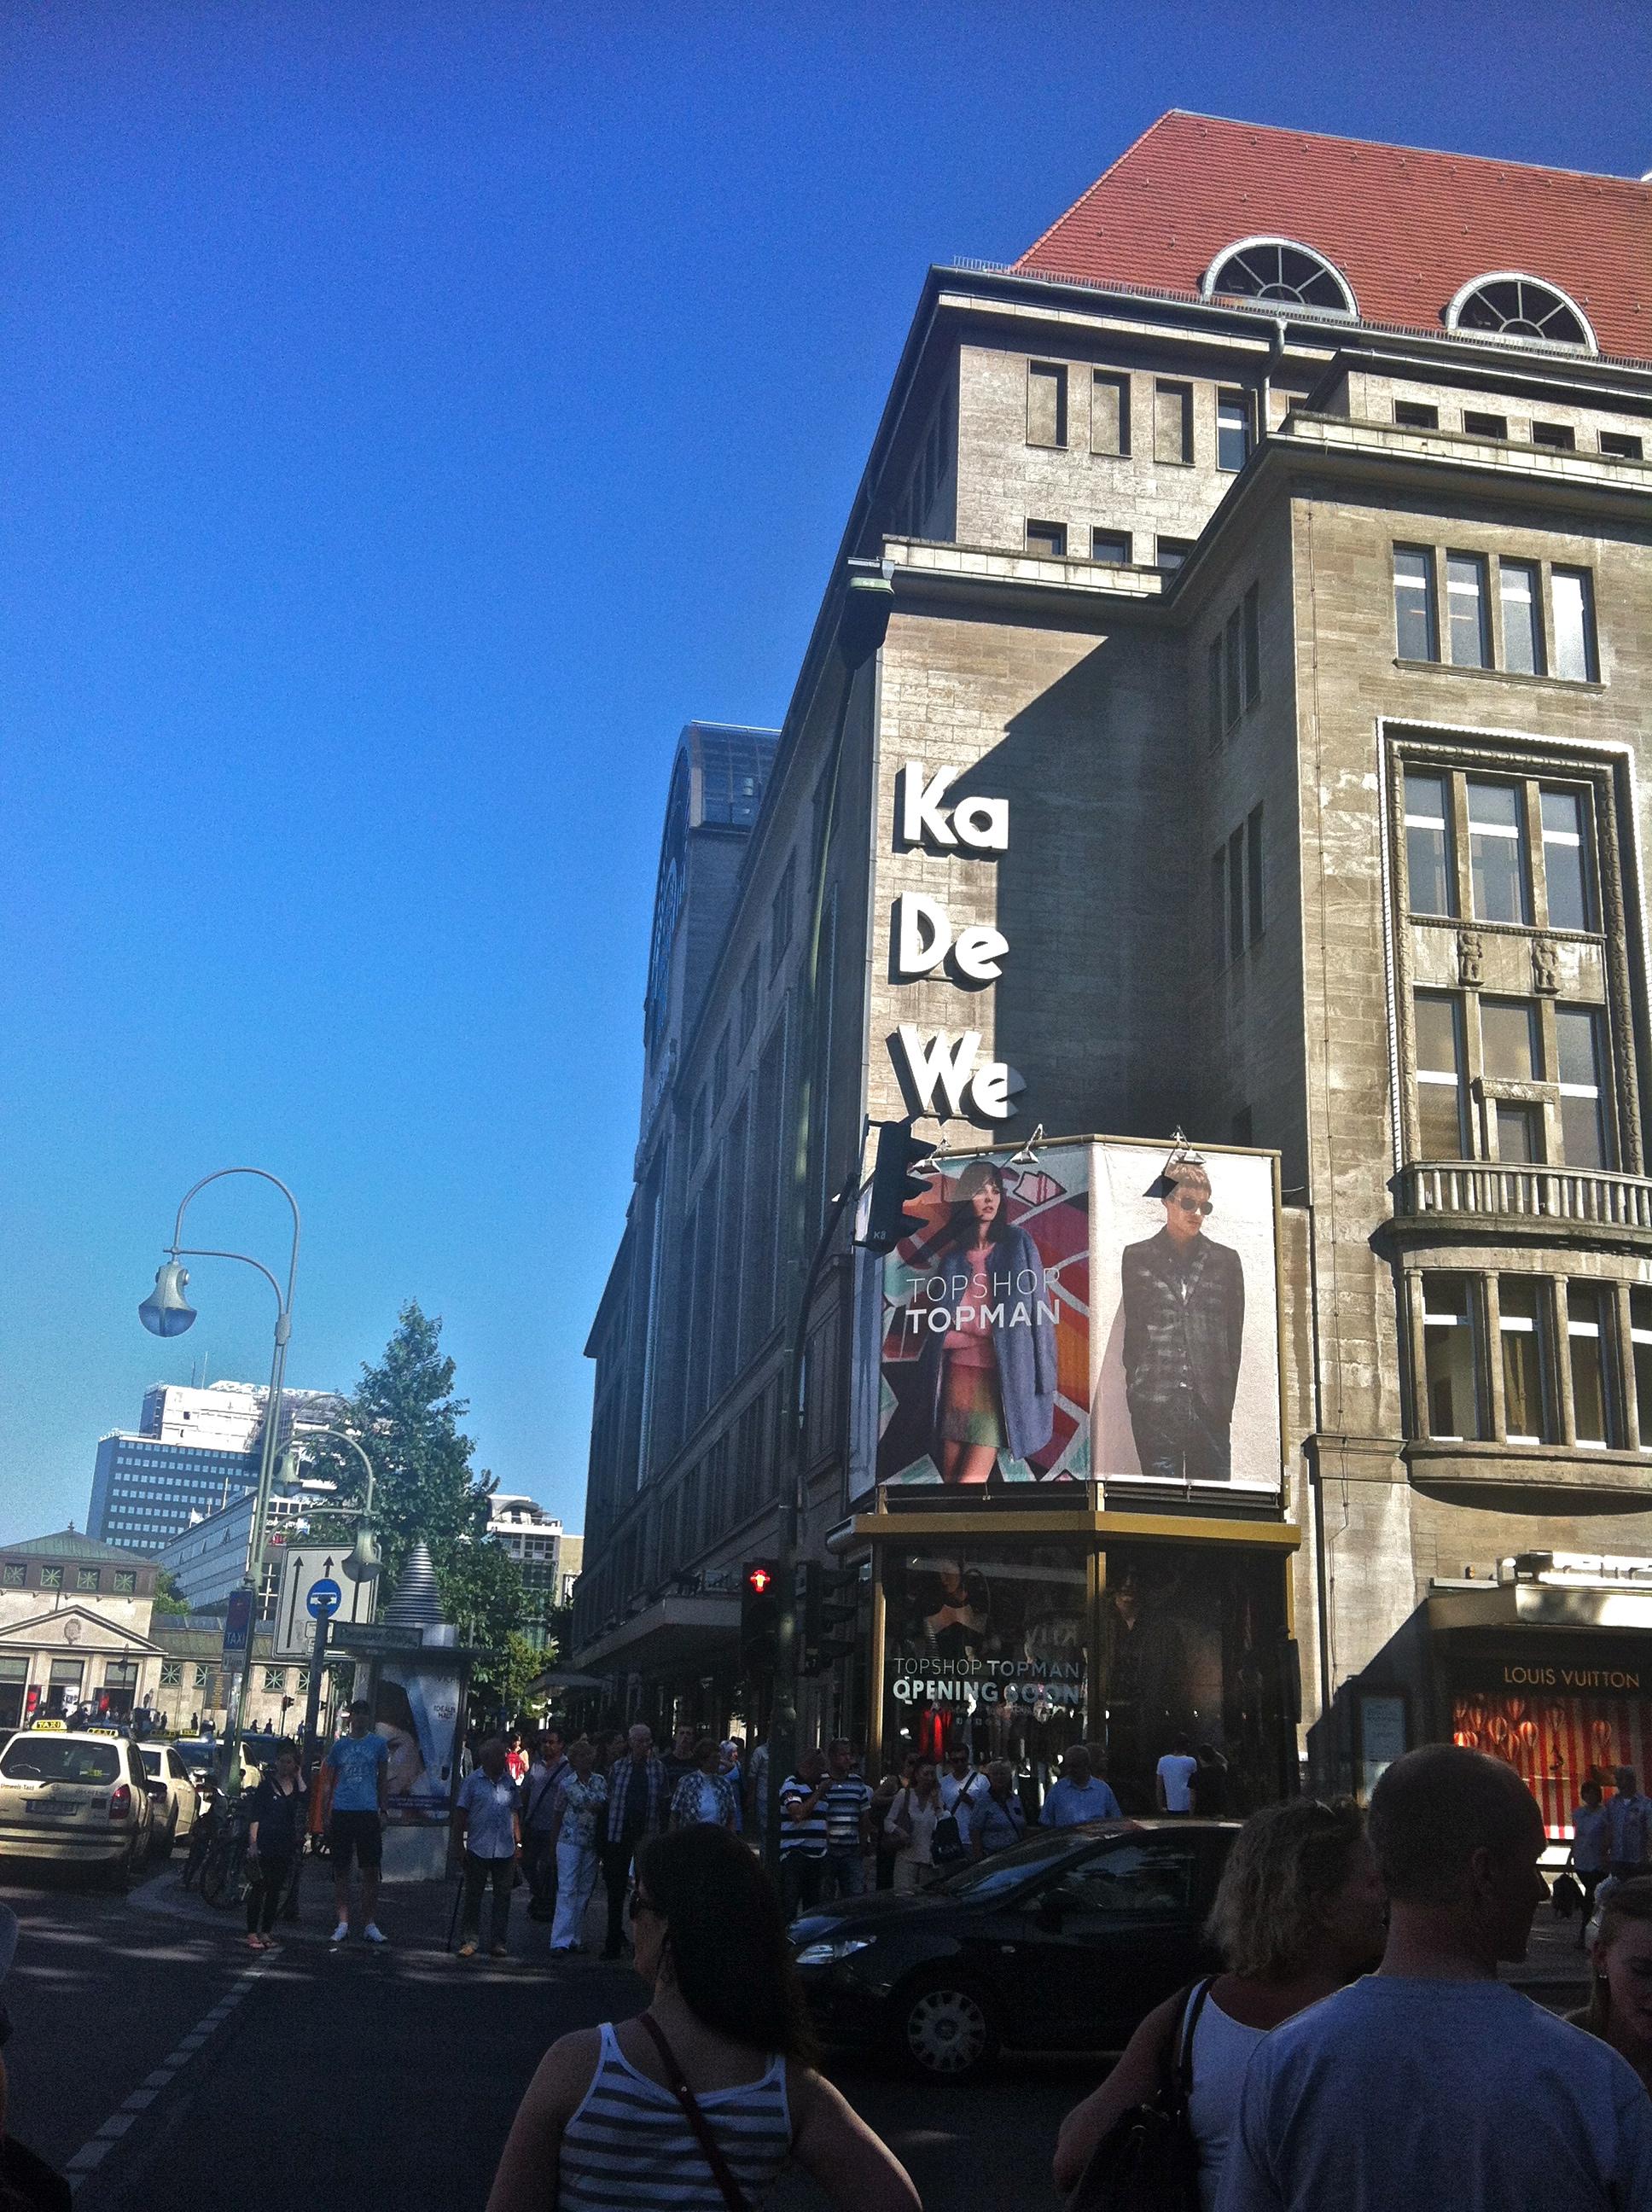 Ka De We (Store)